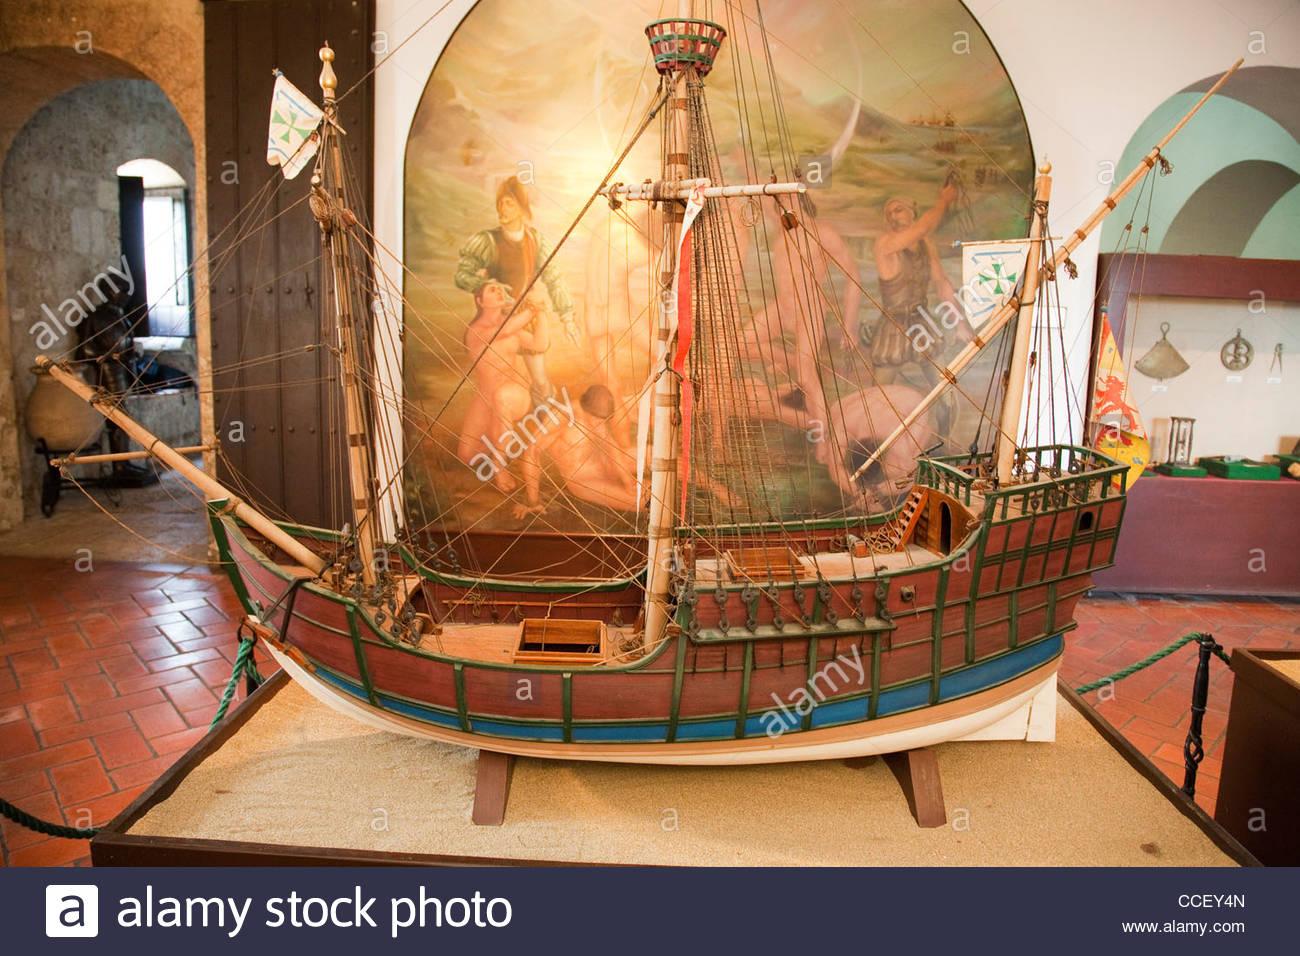 caravel st mary of christopher columbus,santo domingo,hispaniola,dominican republic,caribbean - Stock Image